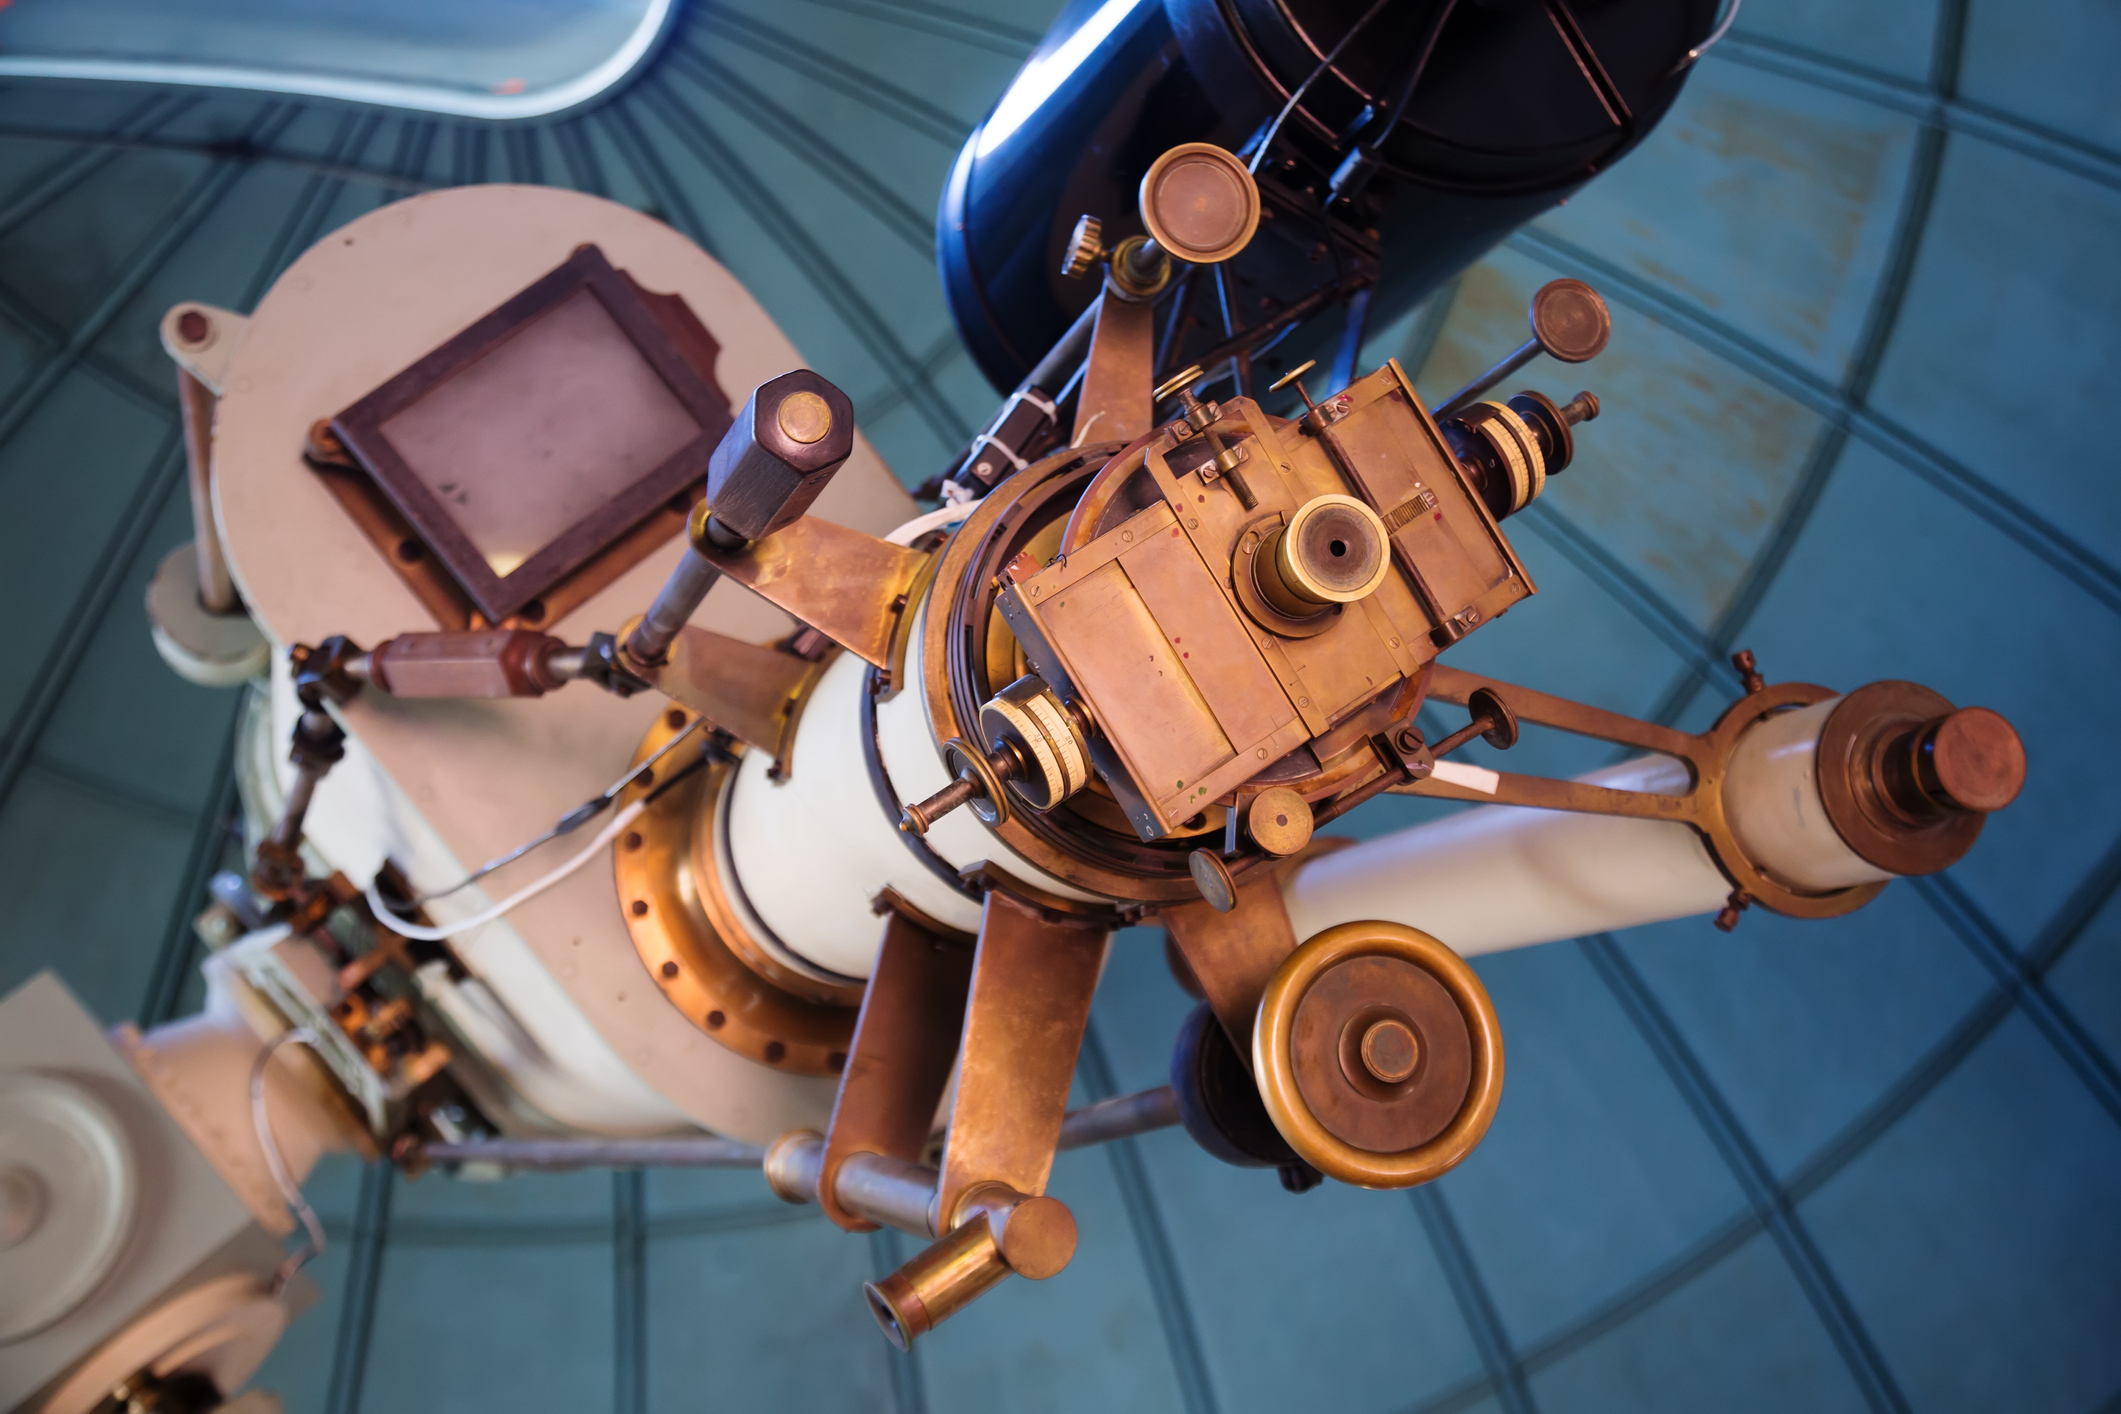 Professional telescope | Decatur Museums